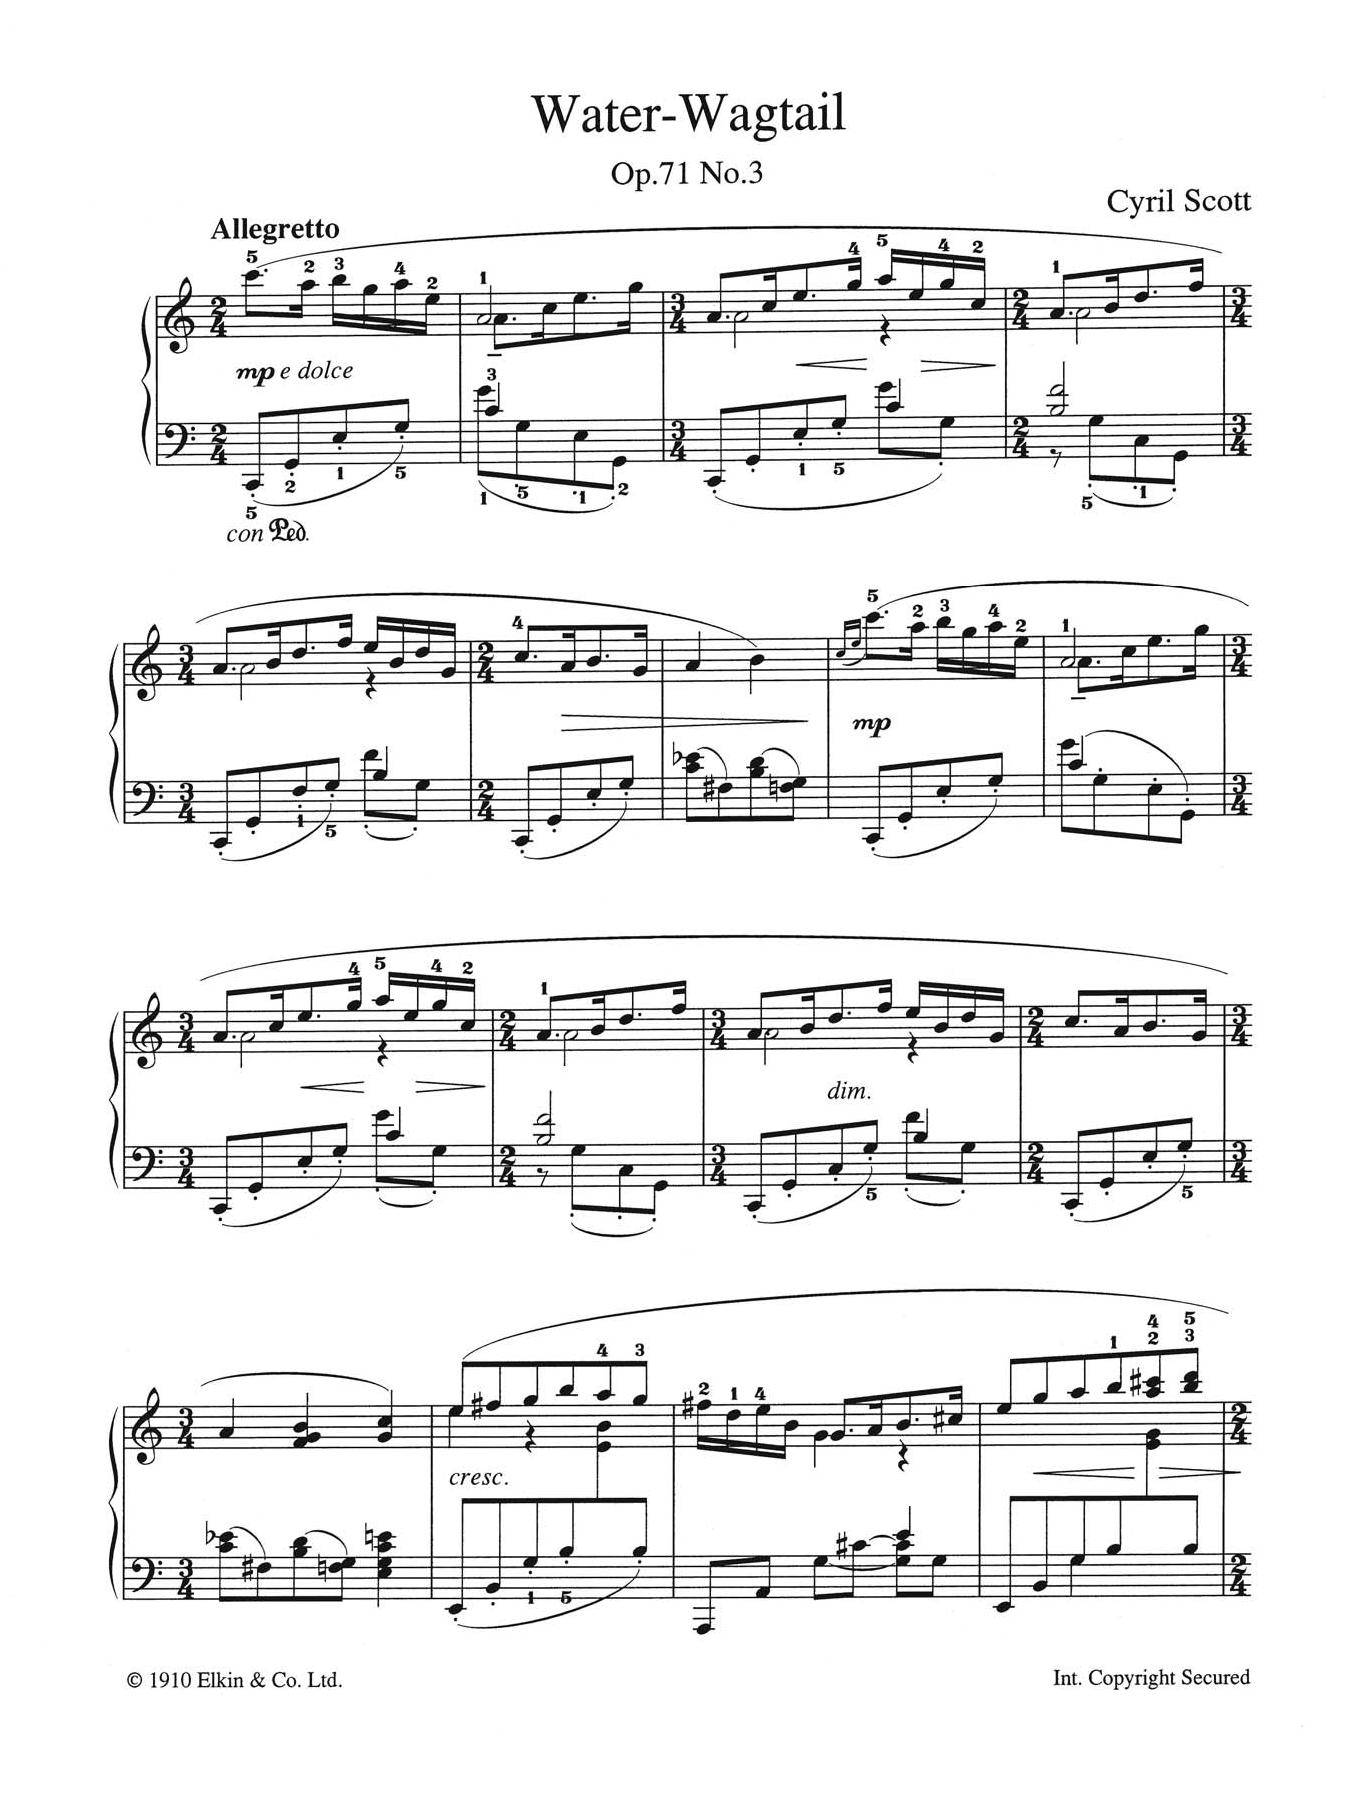 Water-Wagtail Op. 71 No. 3 Sheet Music